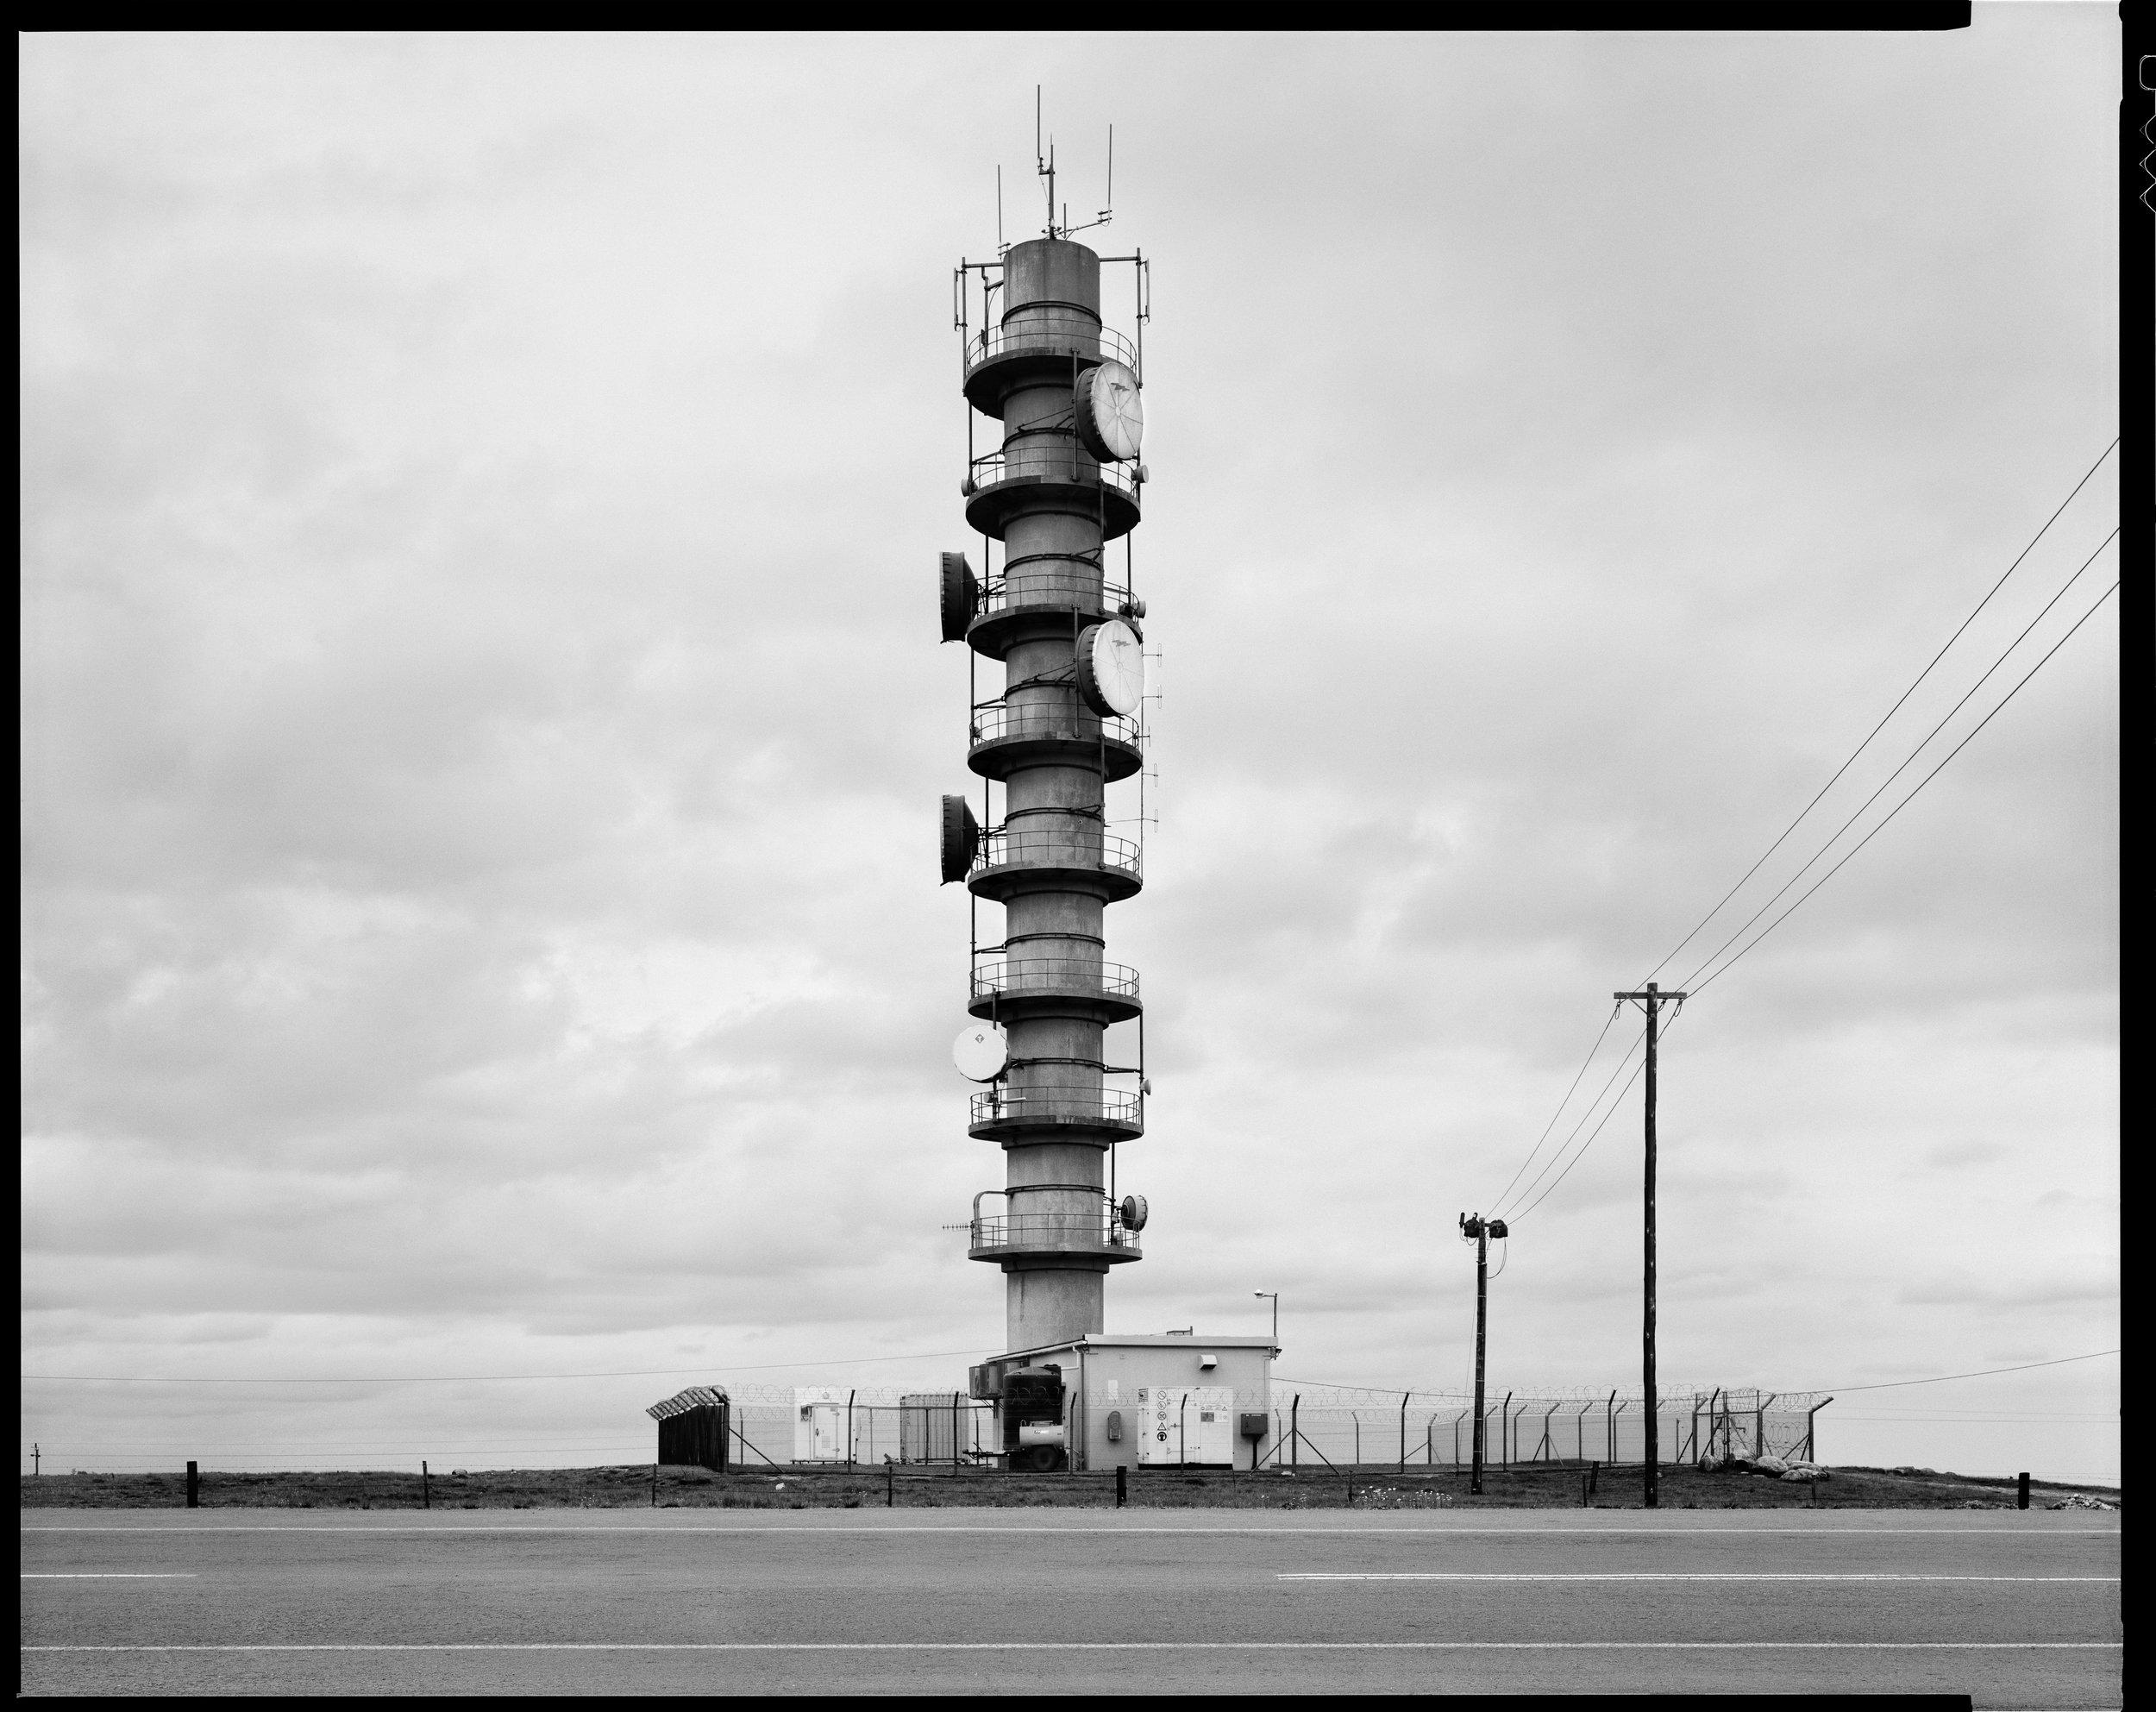 005___Untitled (Antenna Tower).jpg